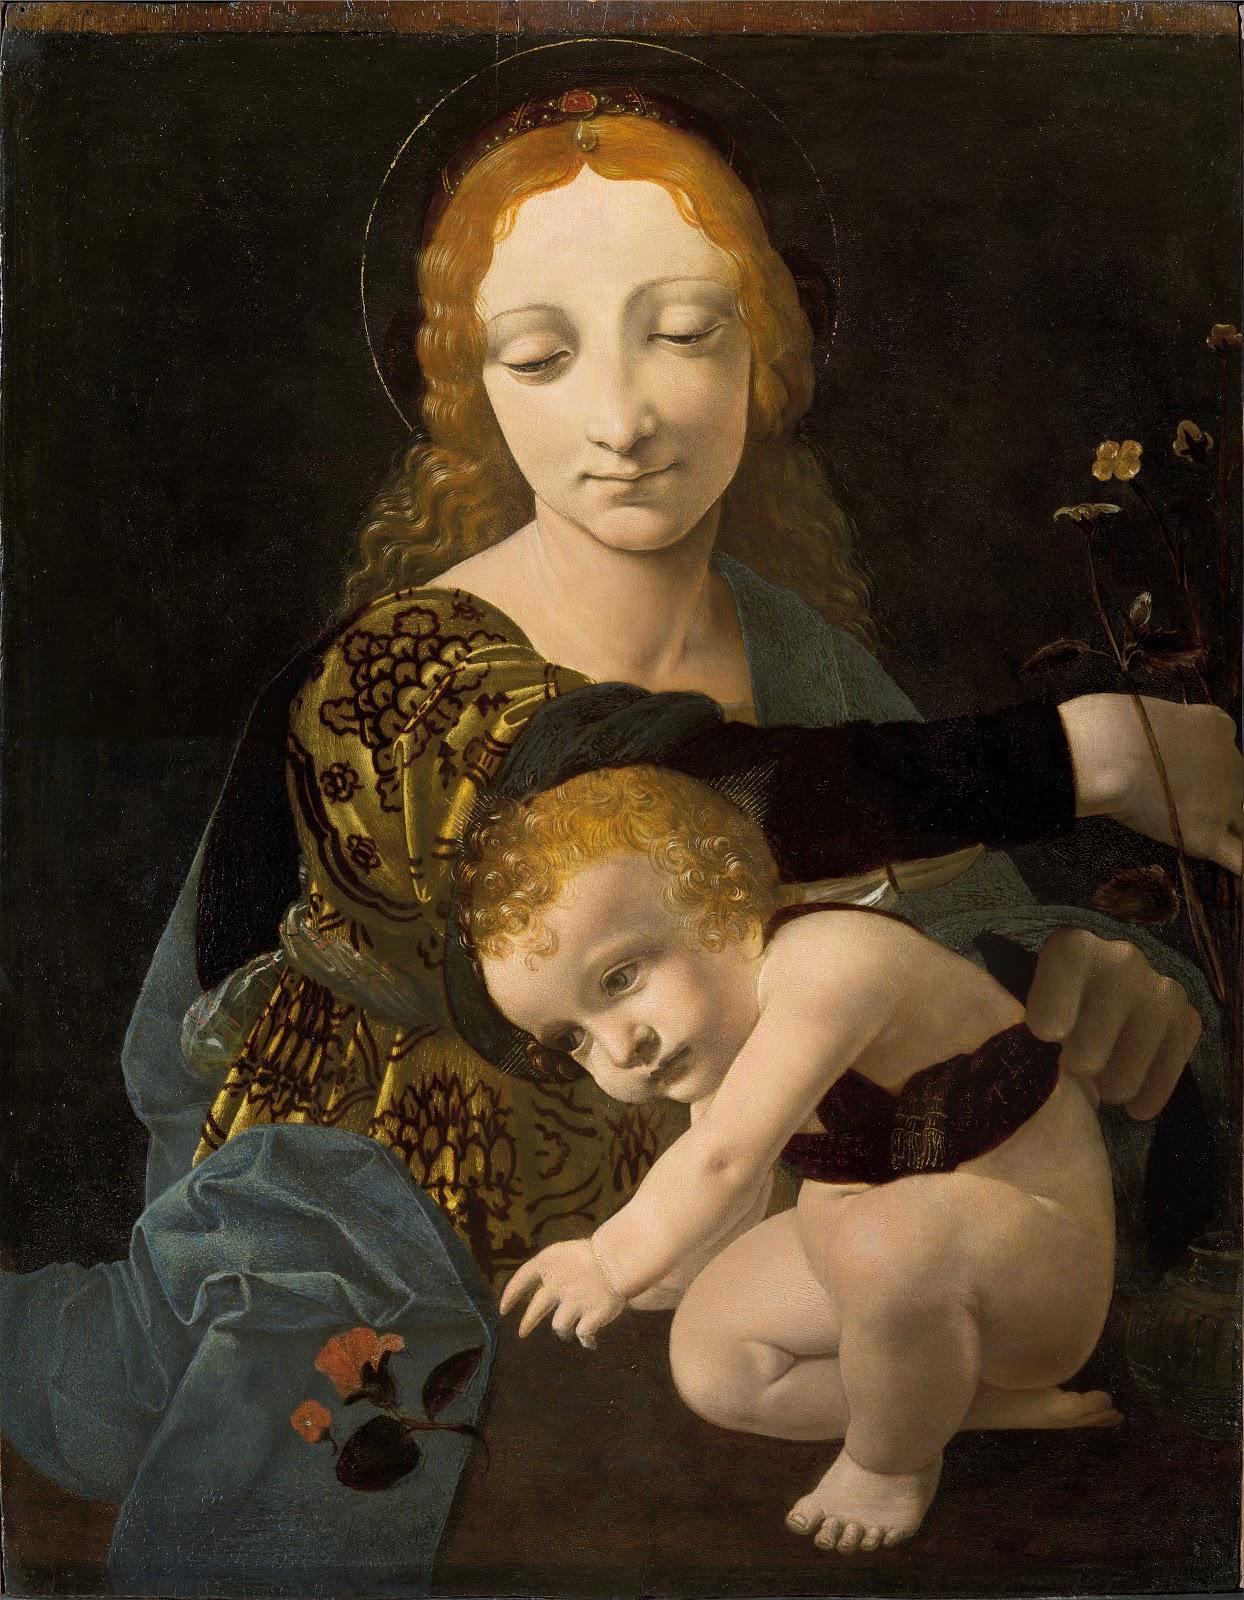 Джованни Антонио Ольтраффи Мадонна с Амбино Музей Полди Пеццоли Милан